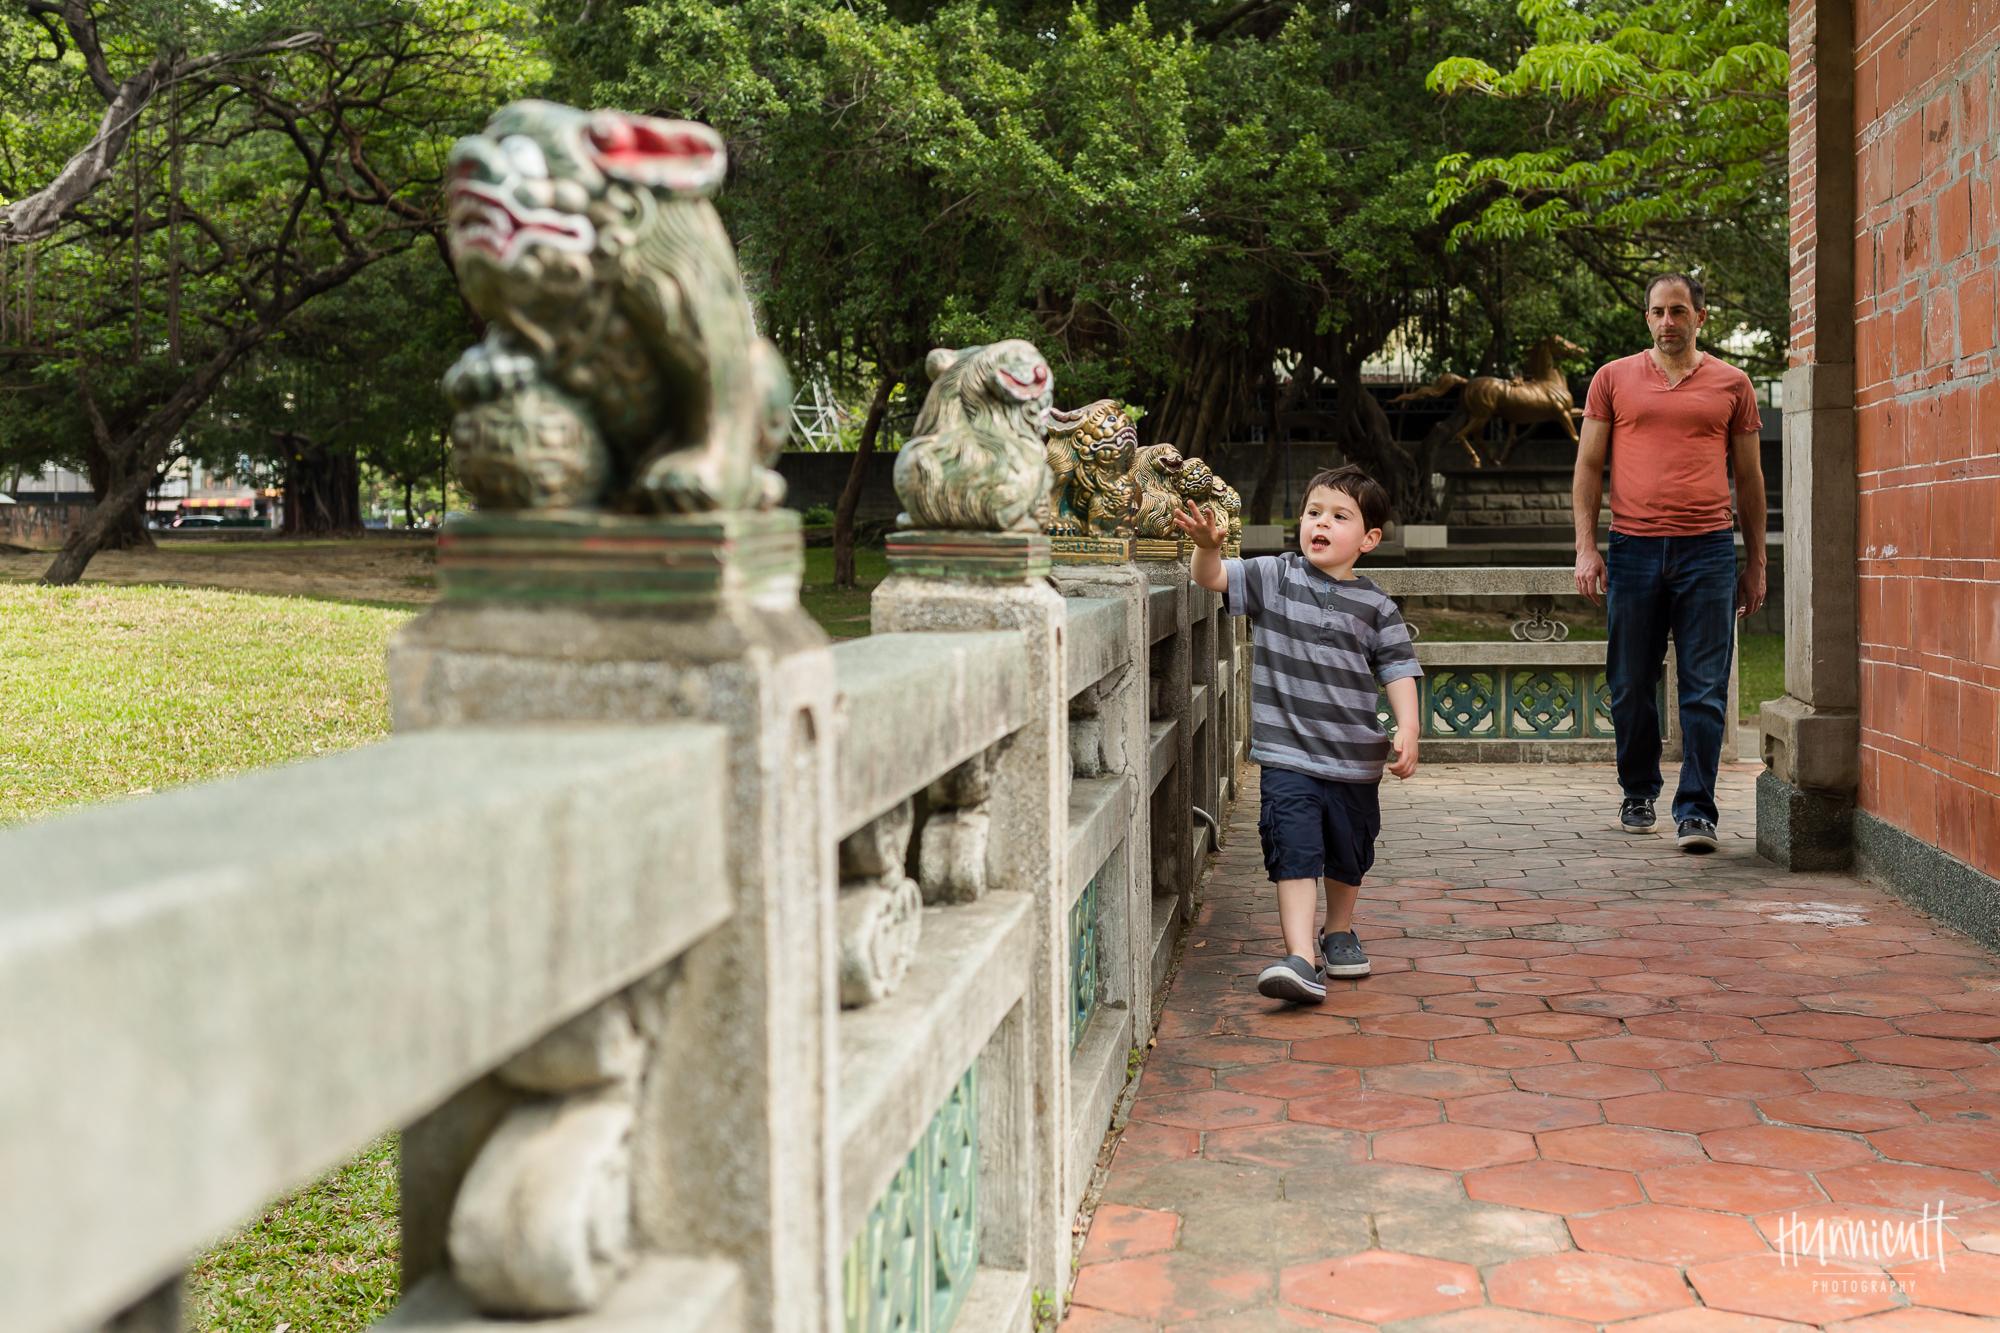 Family-Outdoor-Lifestyle-Modern-Urban-Travel-Culture-HunnicuttPhotography-RebeccaHunnicuttFarren-Taichung-Taiwan-2